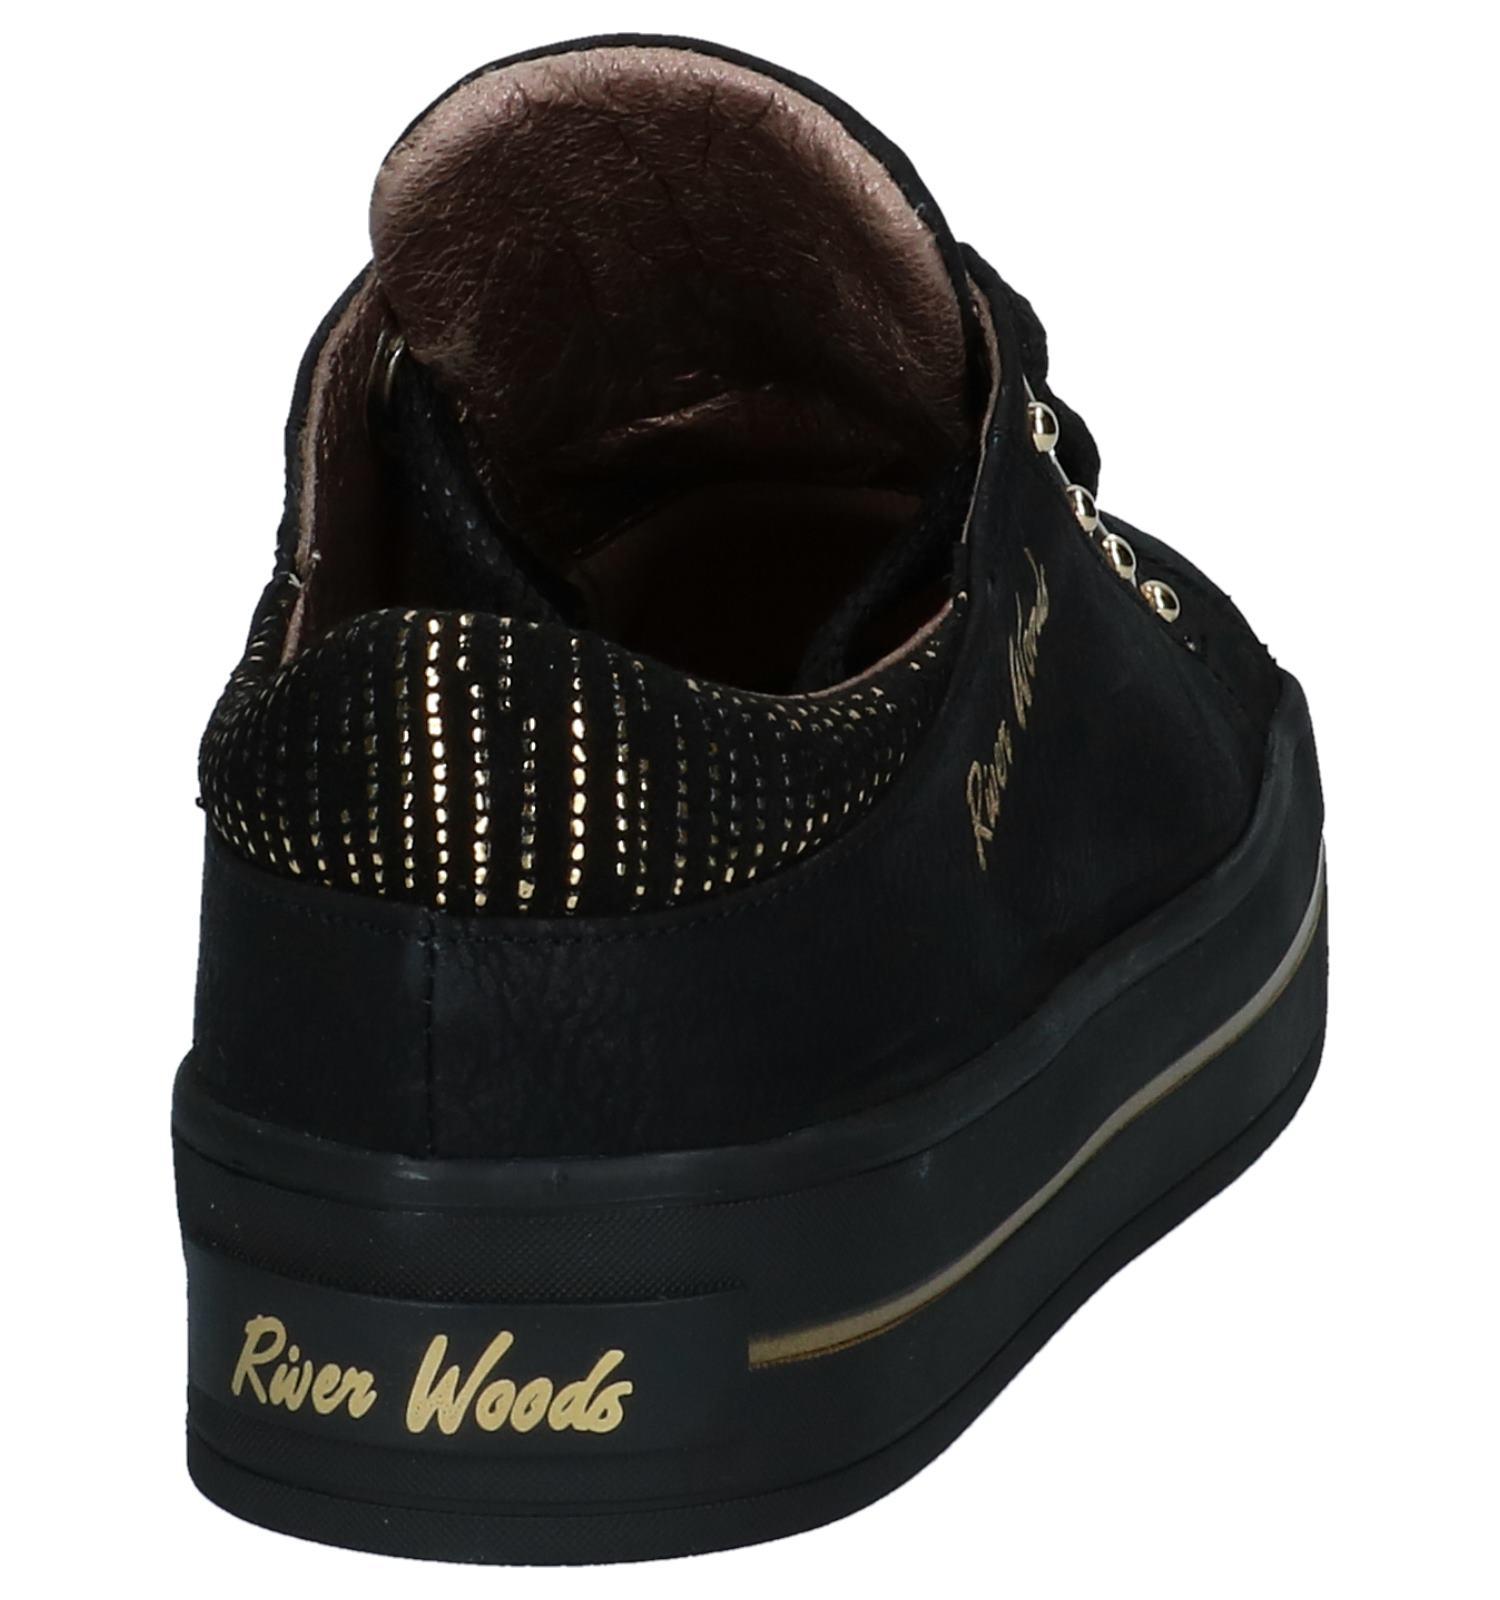 Woods Lage Zwarte Sneakers Geklede River Idee SUVqMzLpG